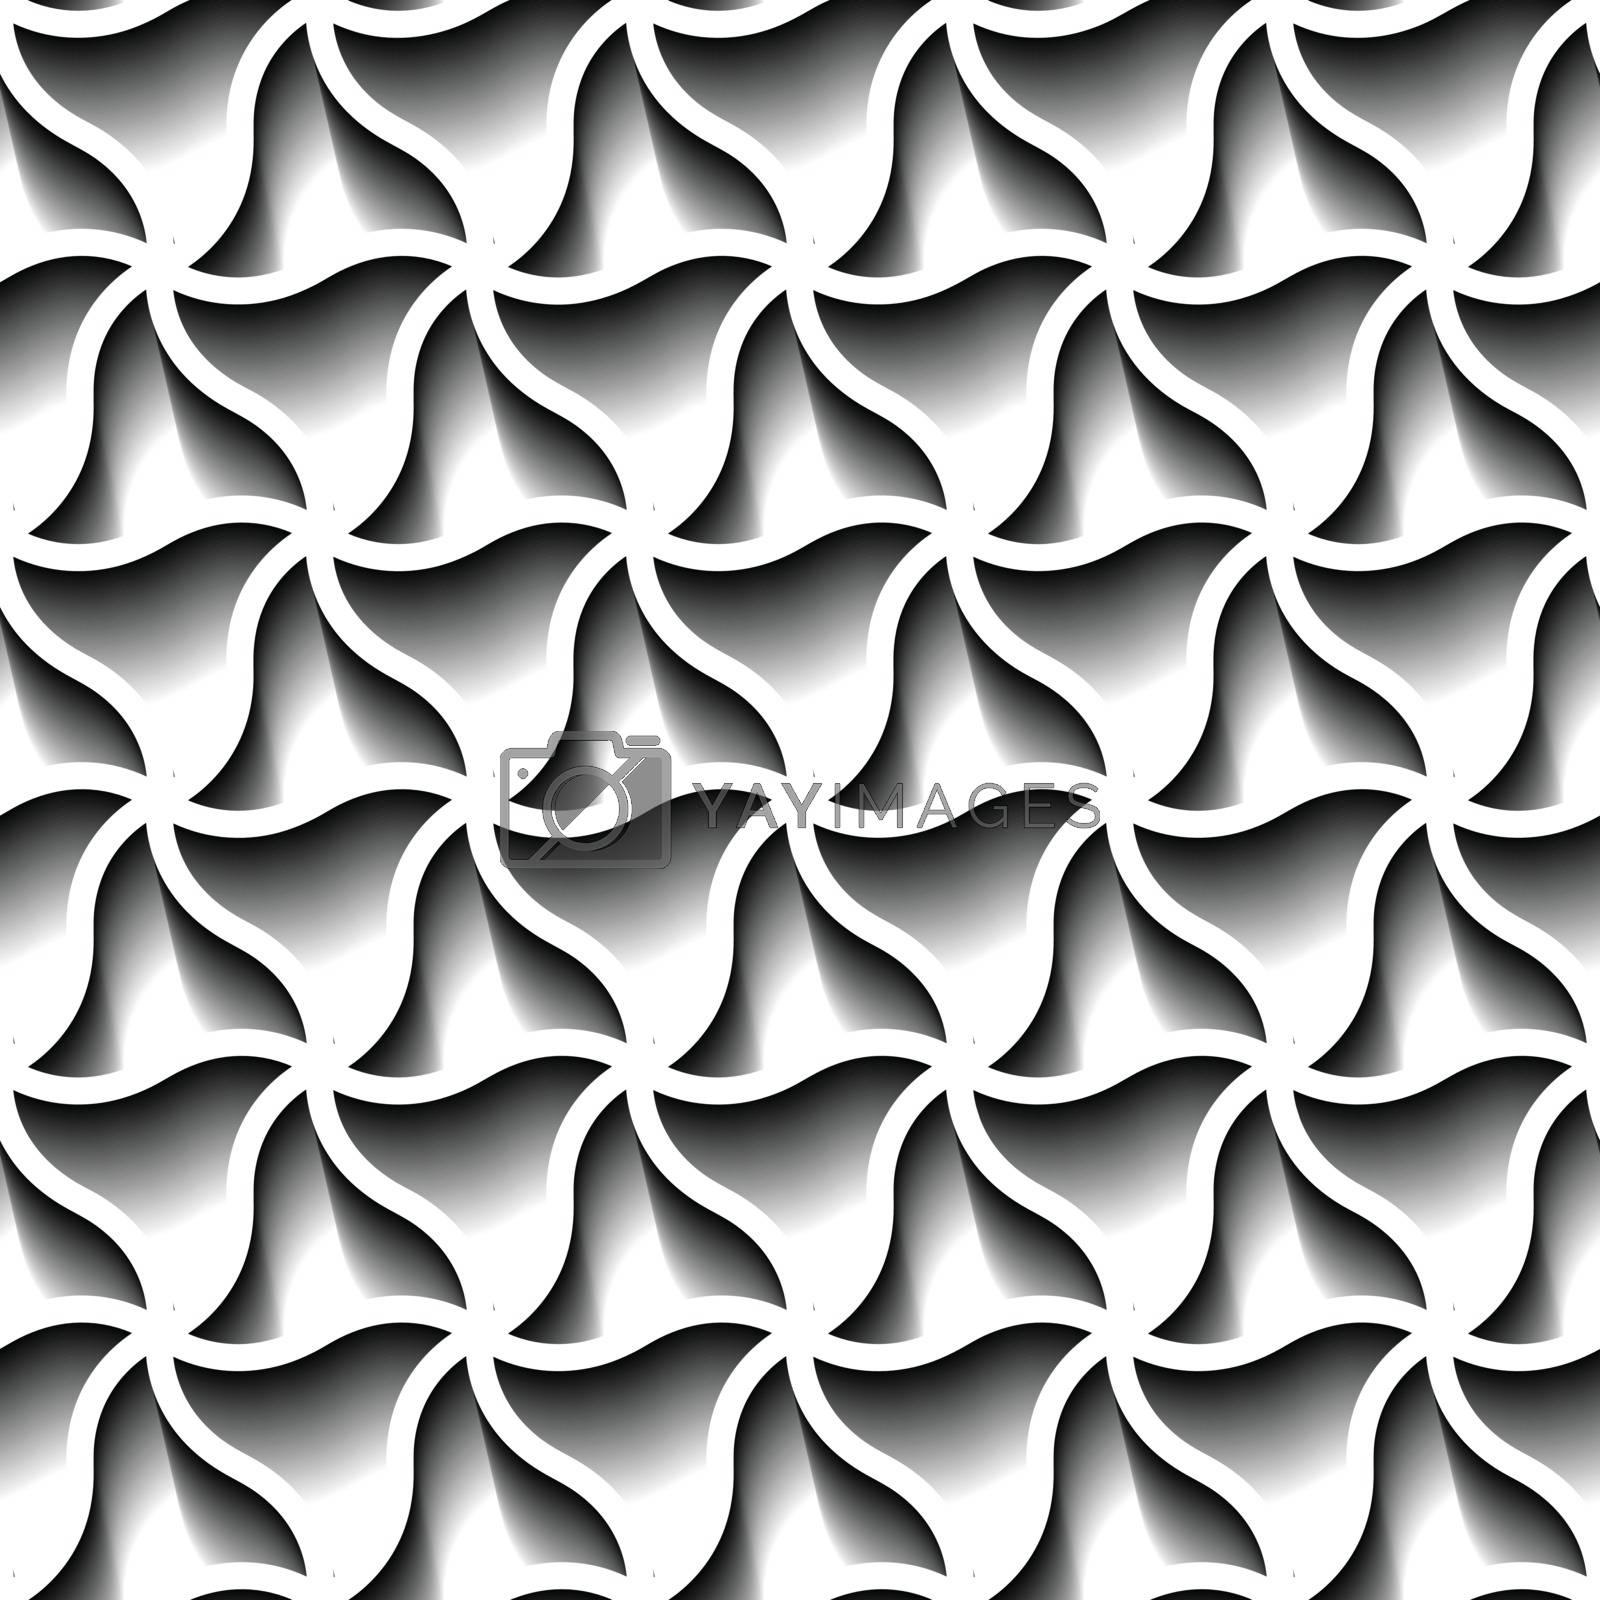 Seamless abstract geometric pattern, prame border futuristic wallpaper, 3d grey tile surface.